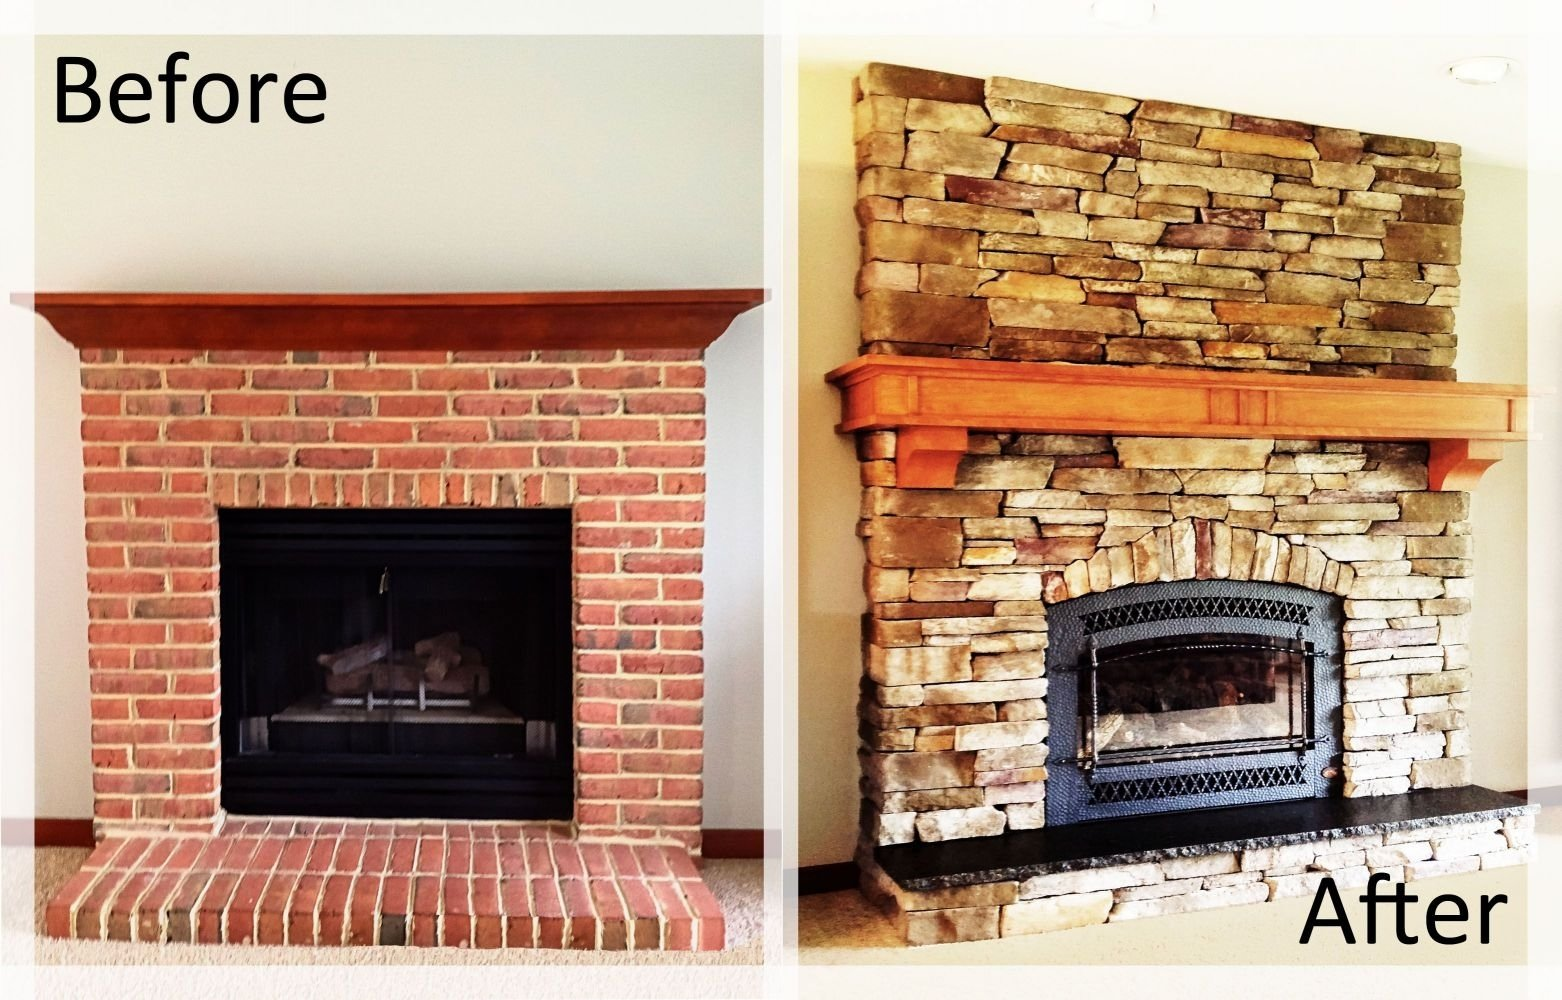 10 Unique Mantel Ideas For Brick Fireplace inspiring white brick fireplace decorating ideas decor image of 2021